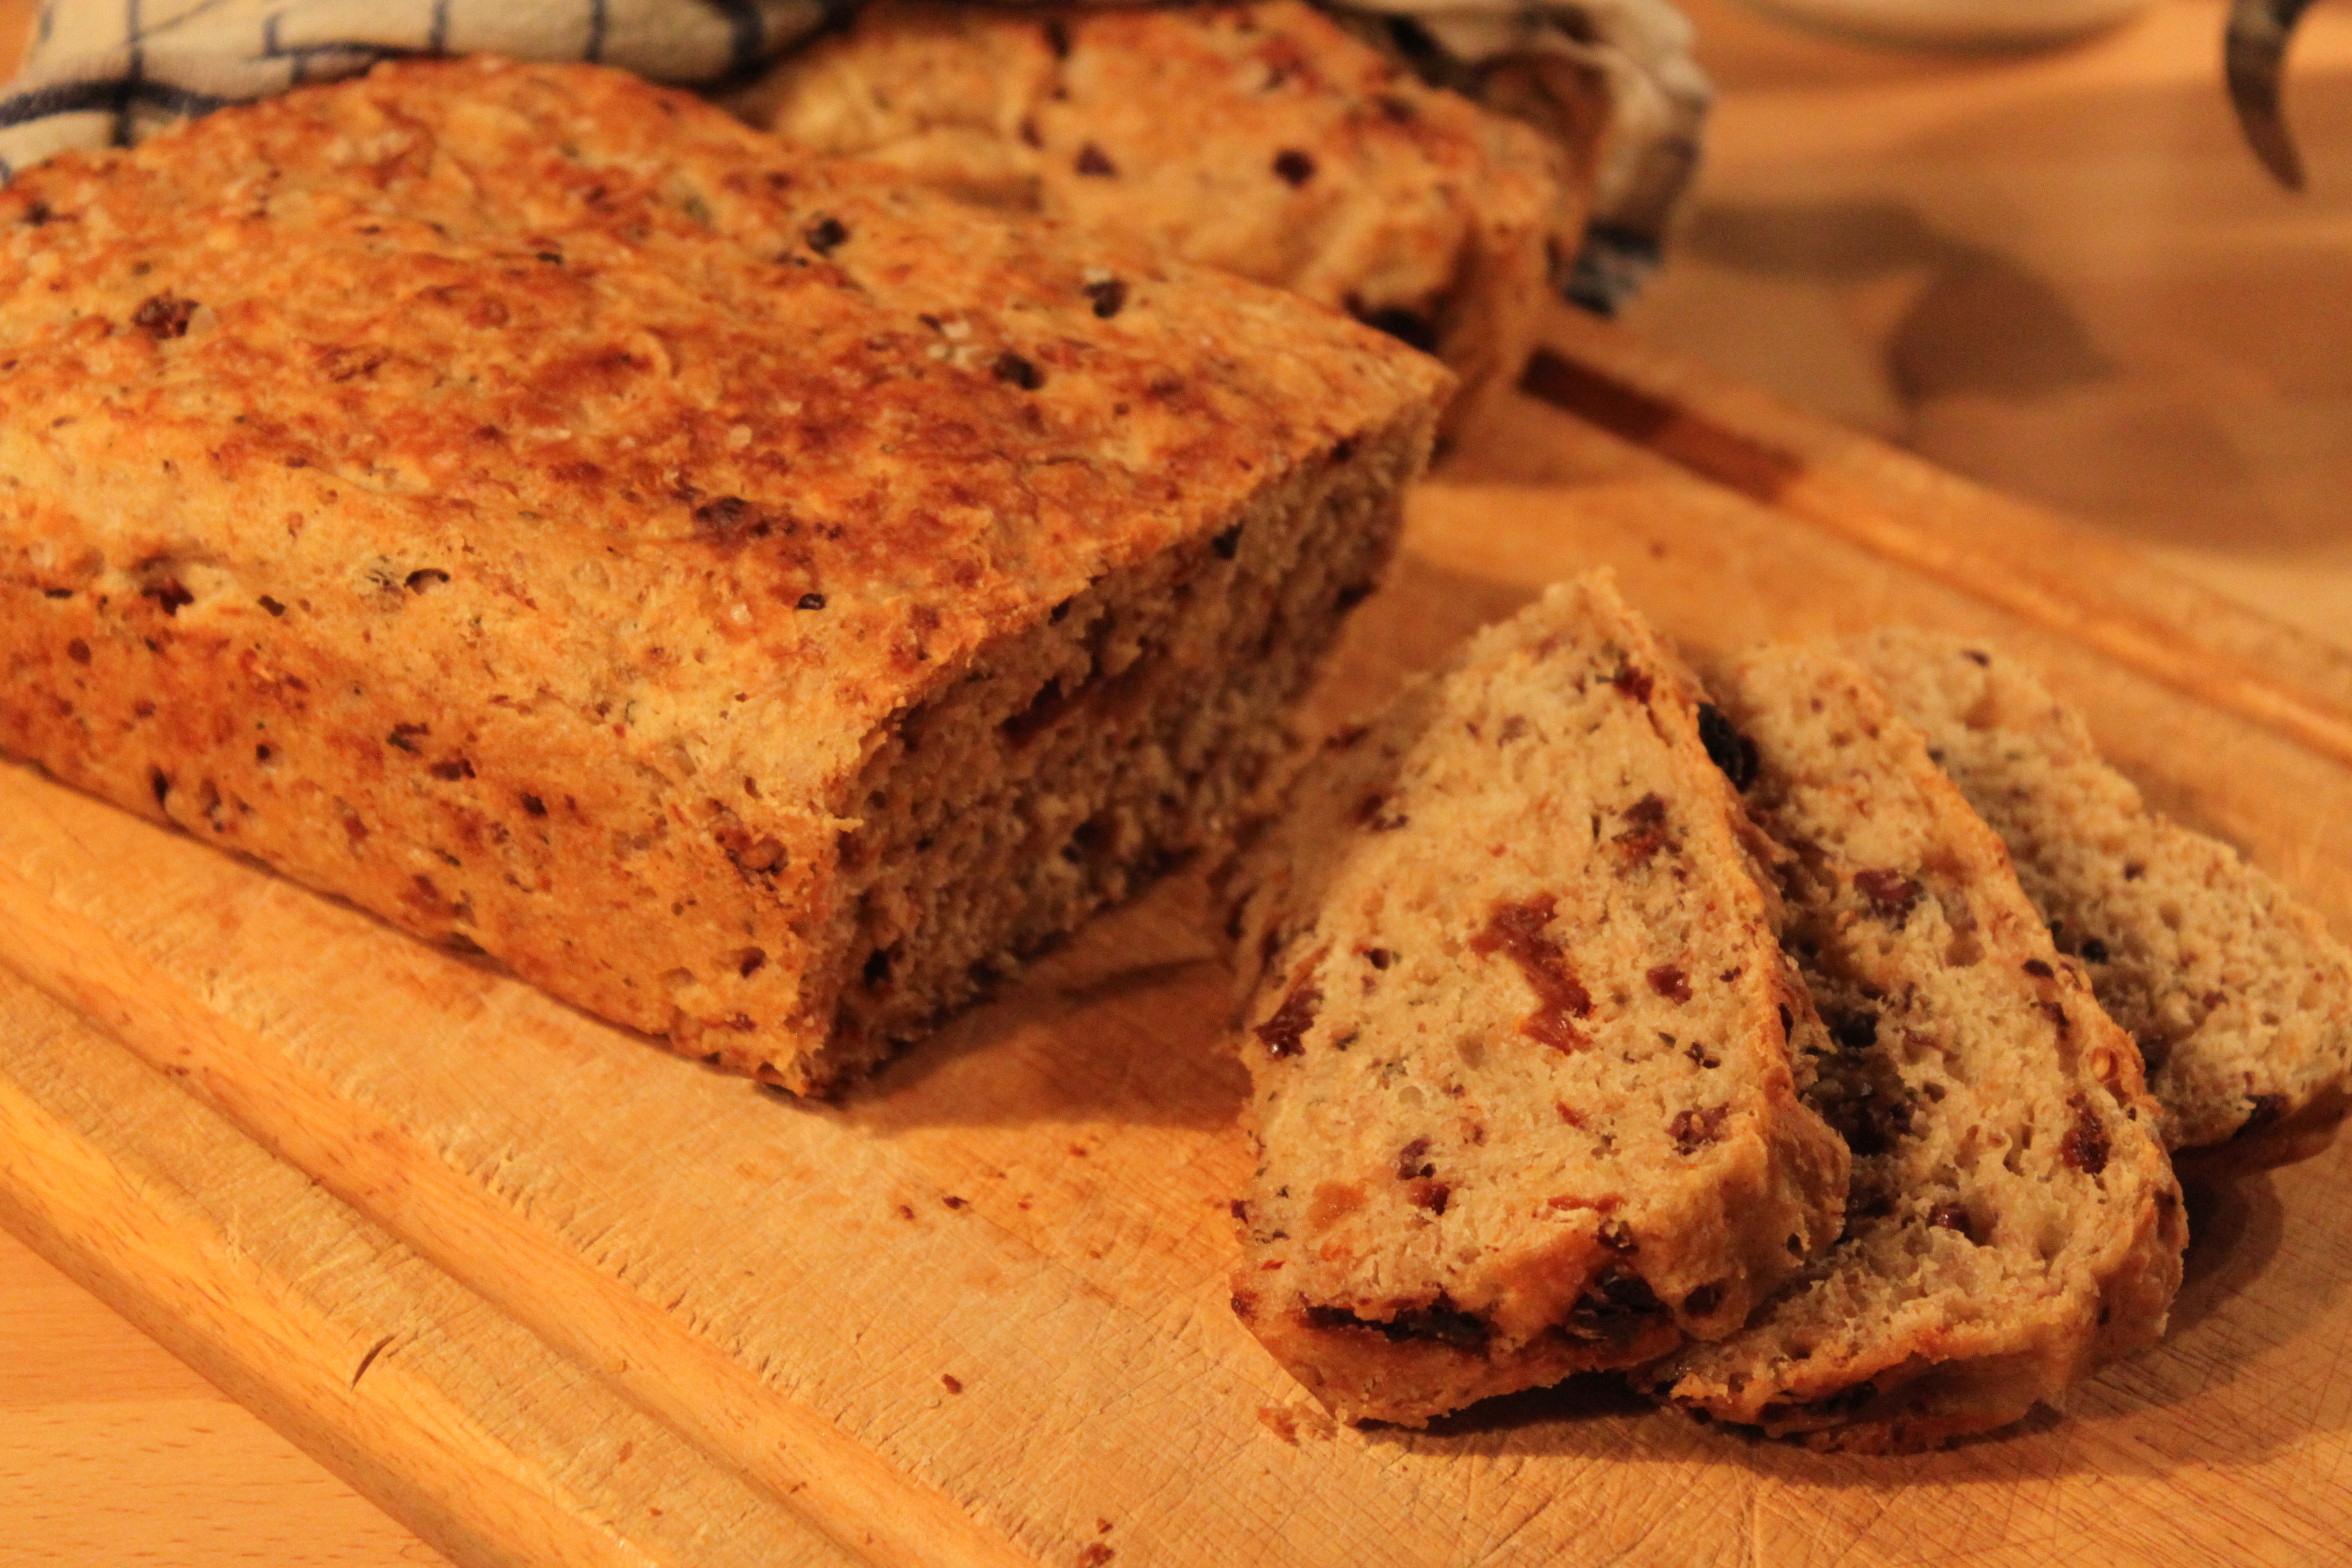 underbart grovt nyttigt bröd